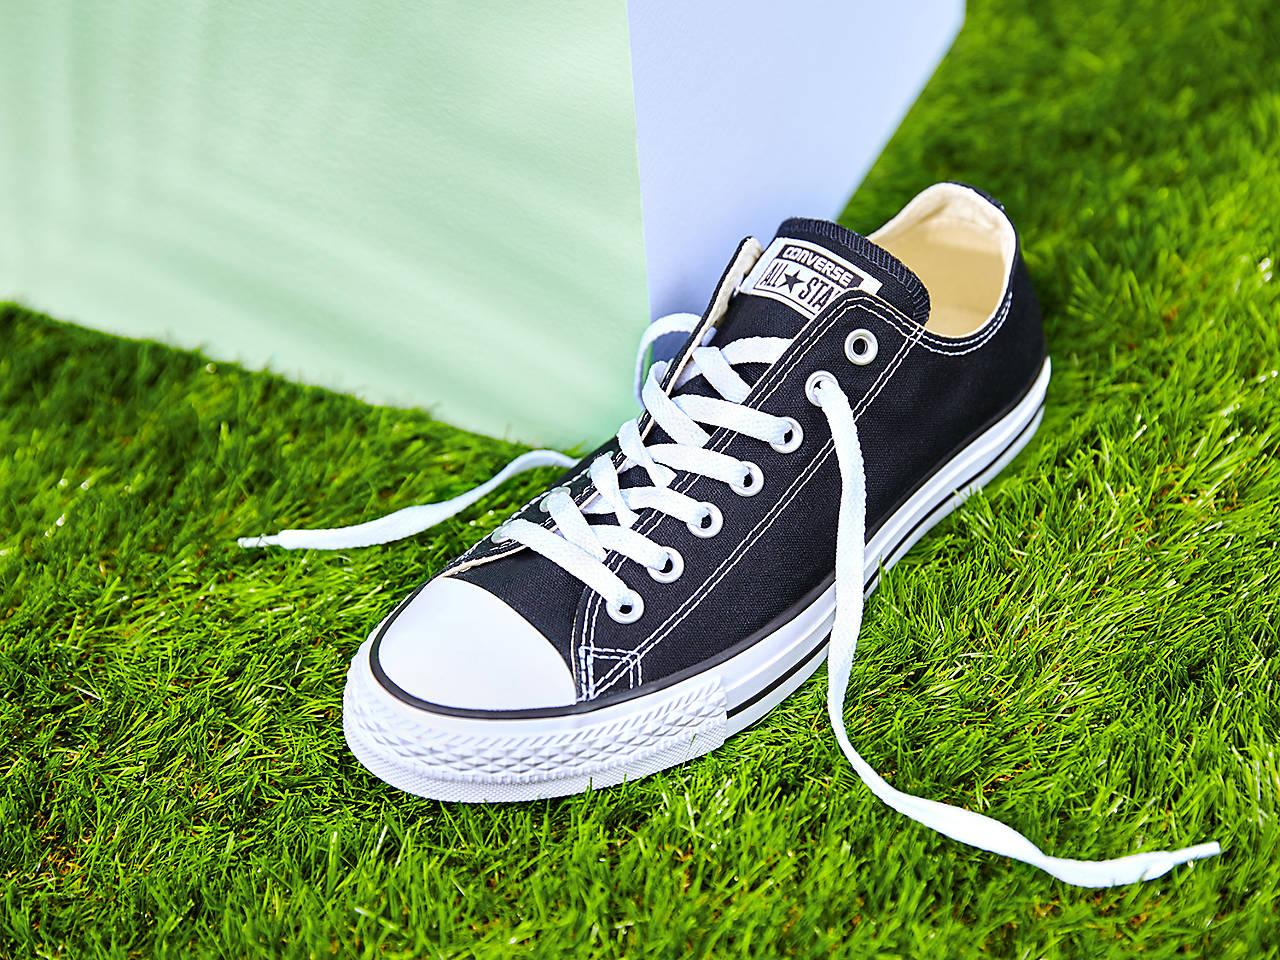 6ec2e9415227 Converse Chuck Taylor All Star Sneaker - Men s Men s Shoes